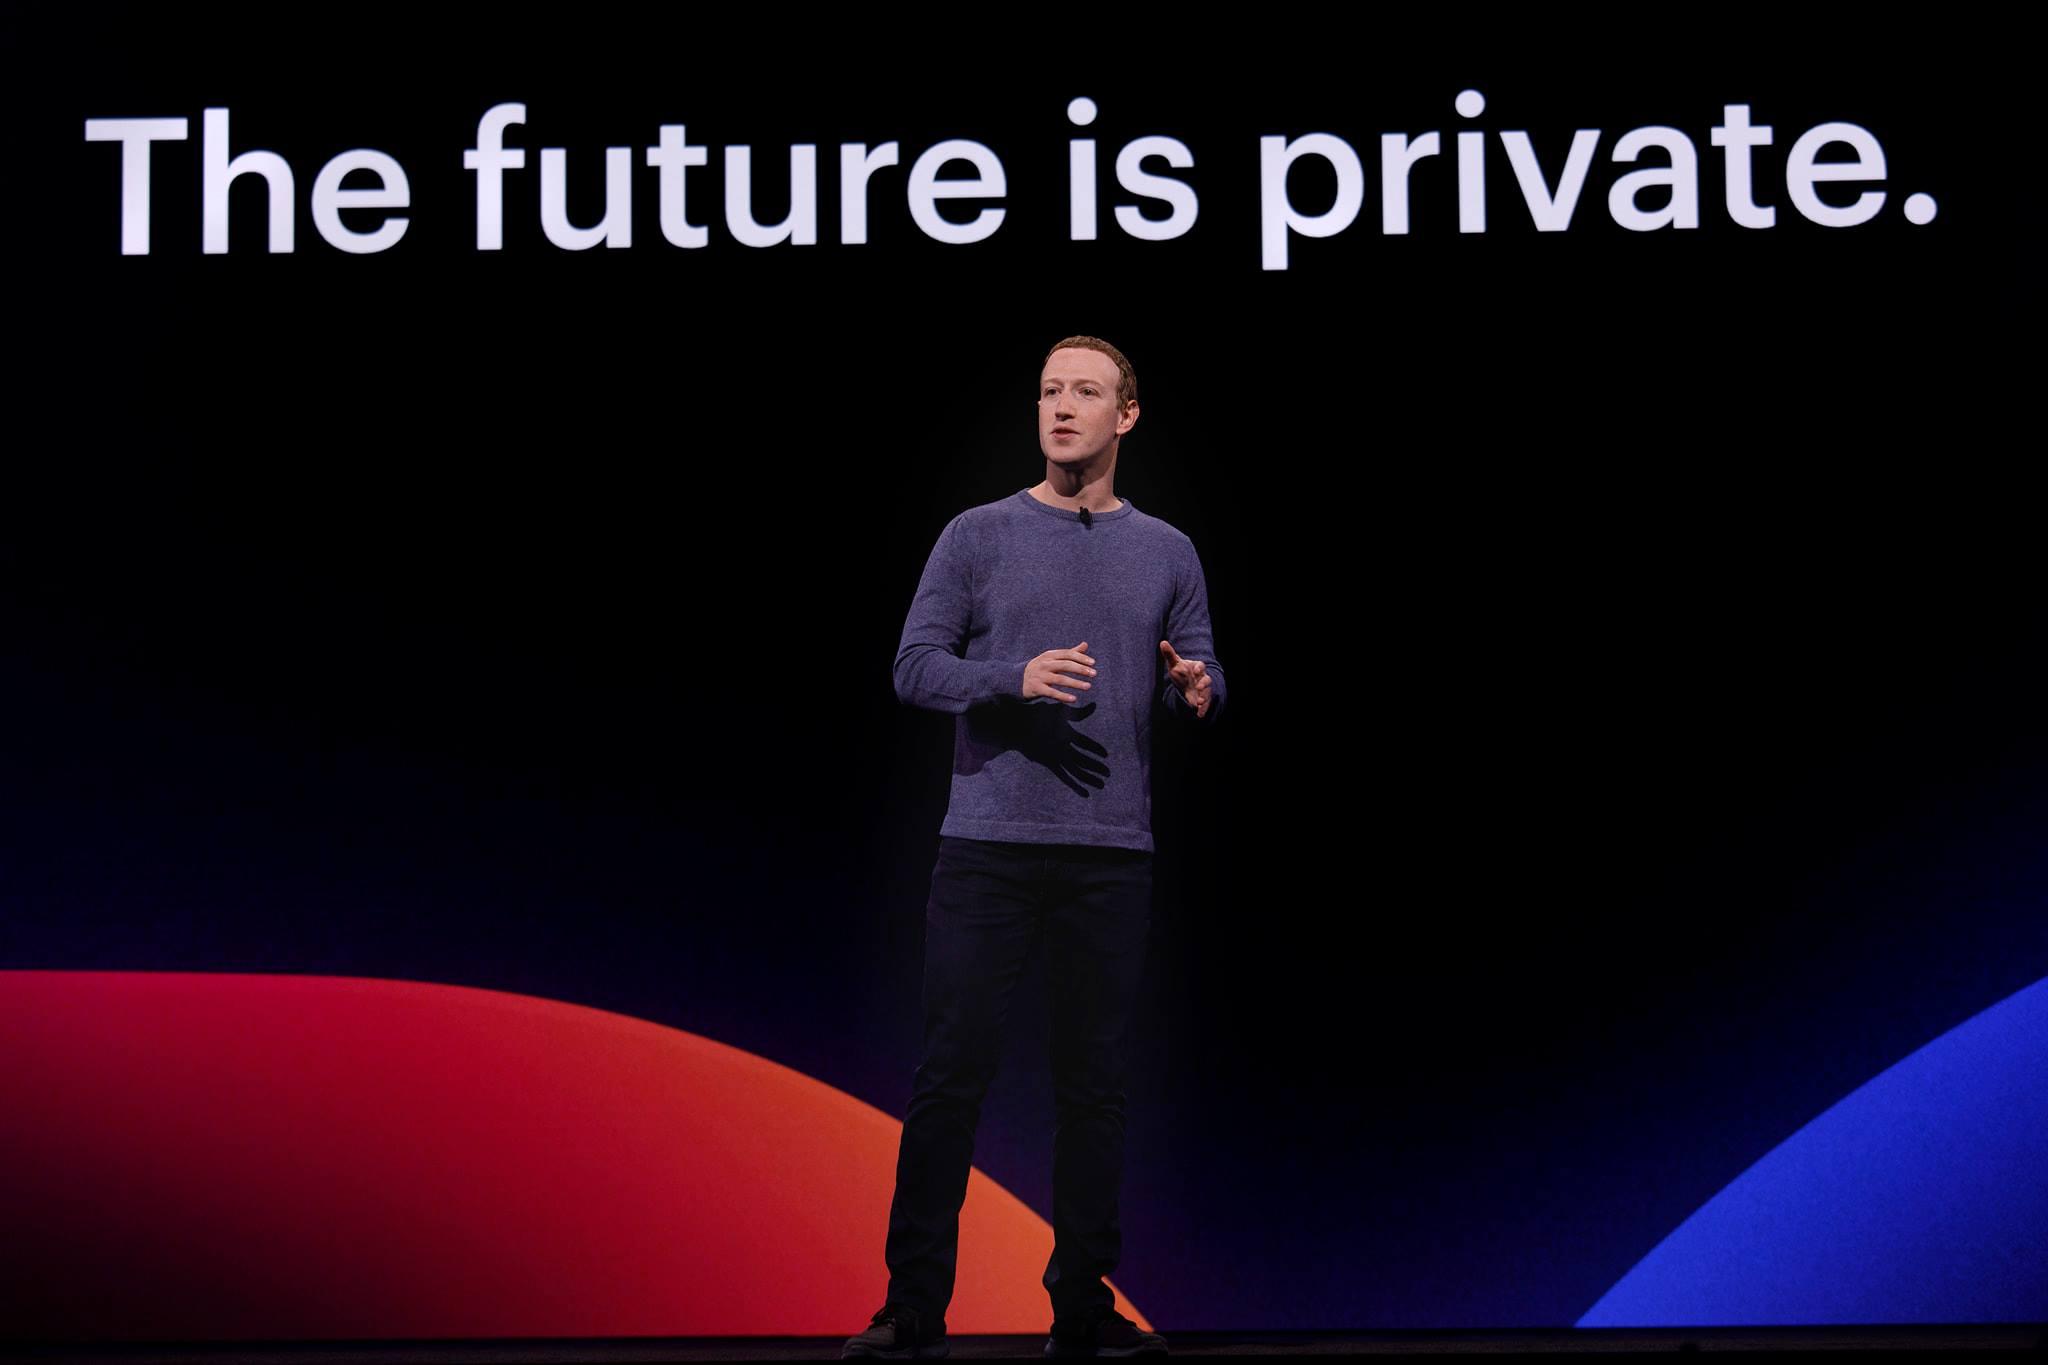 Mark Zuckerberg lors d'une conférence en avril 2019